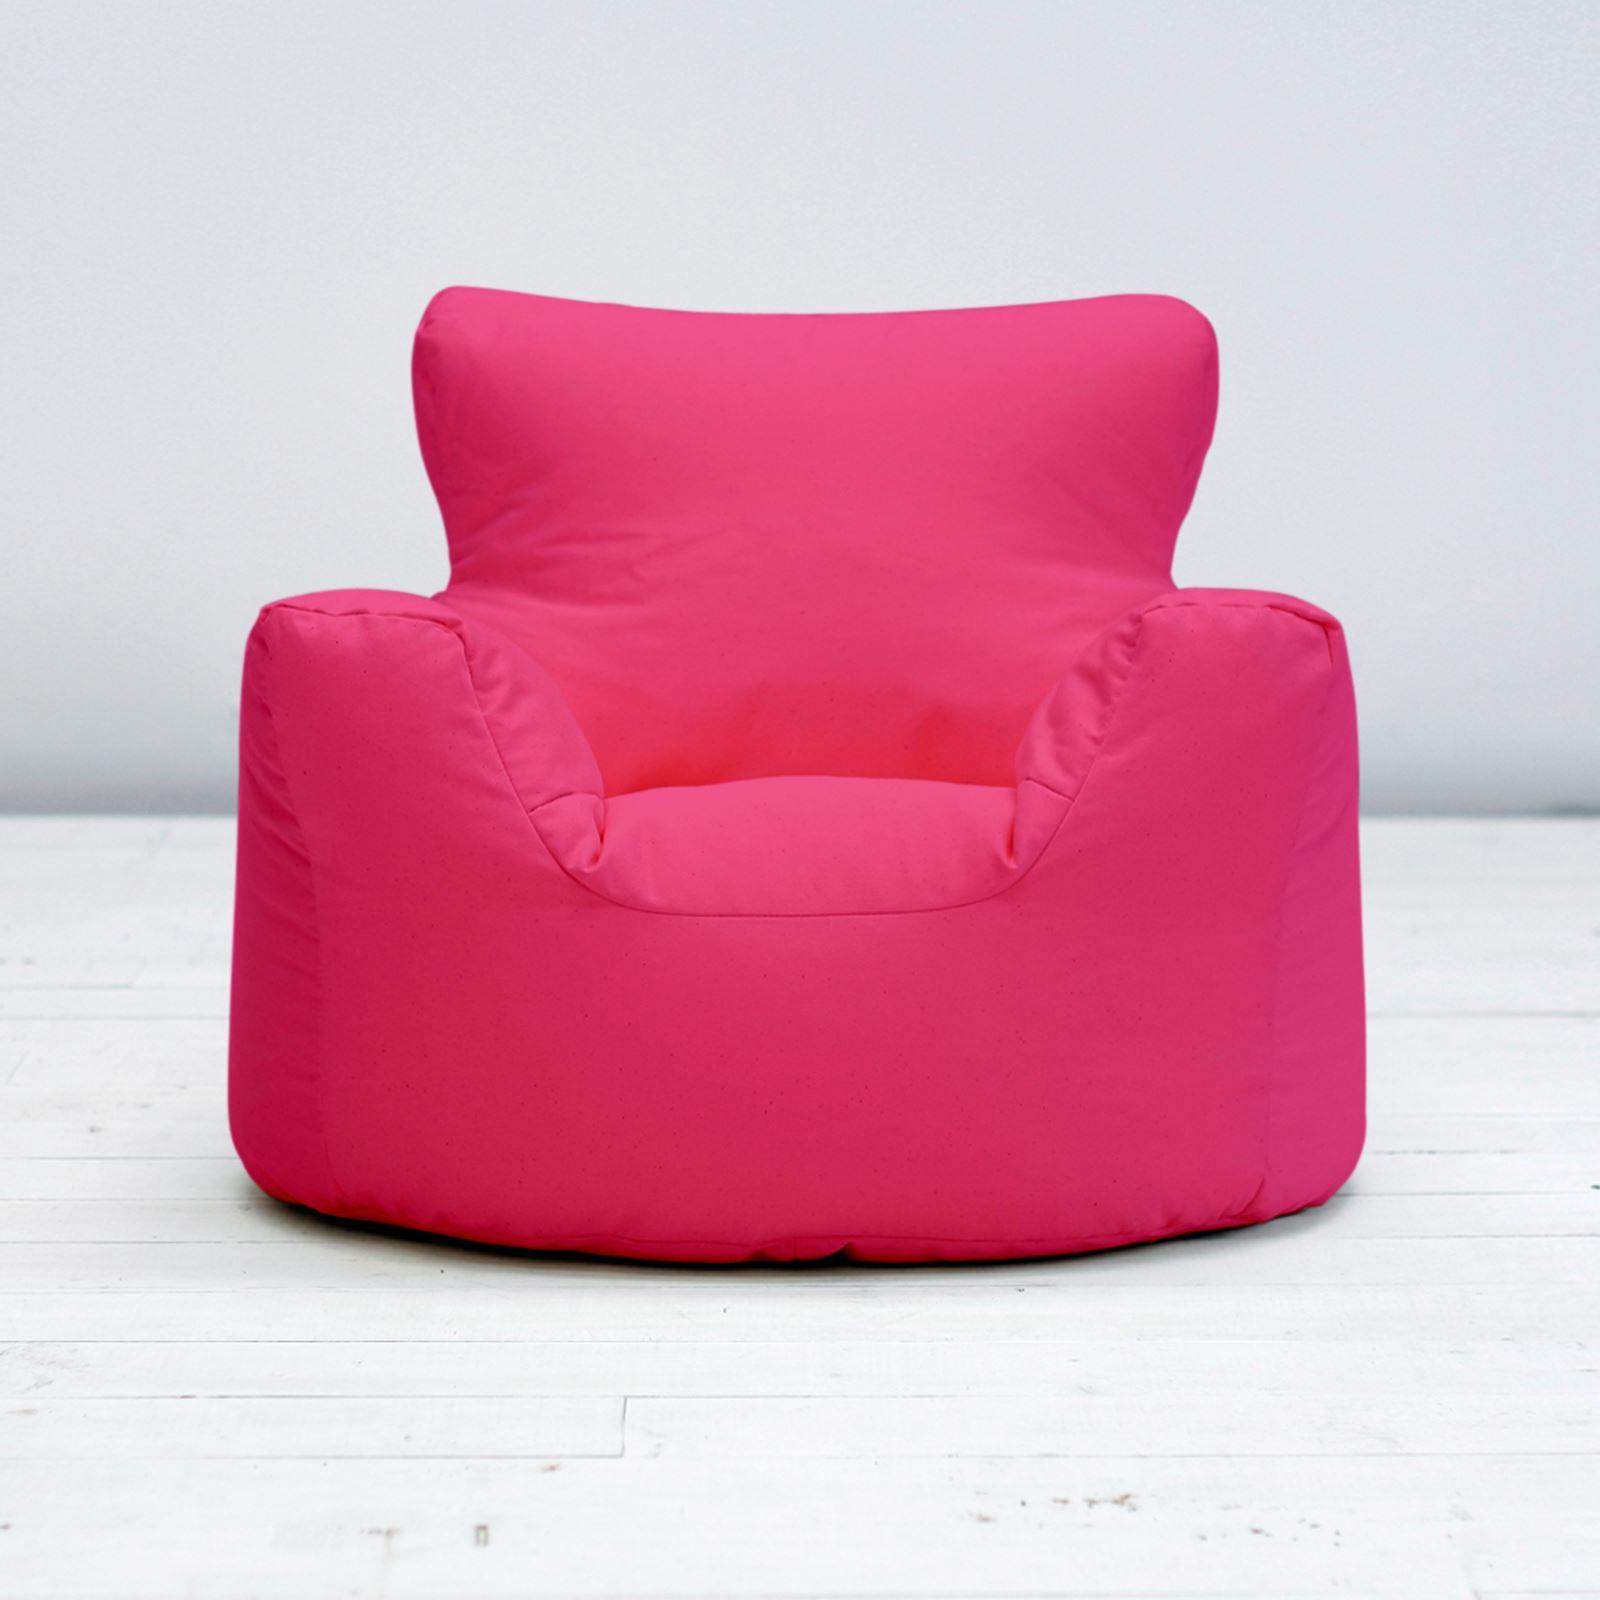 childrens bean bag chairs ergonomic chair pune kids boys girls 100 cotton seat beanbag